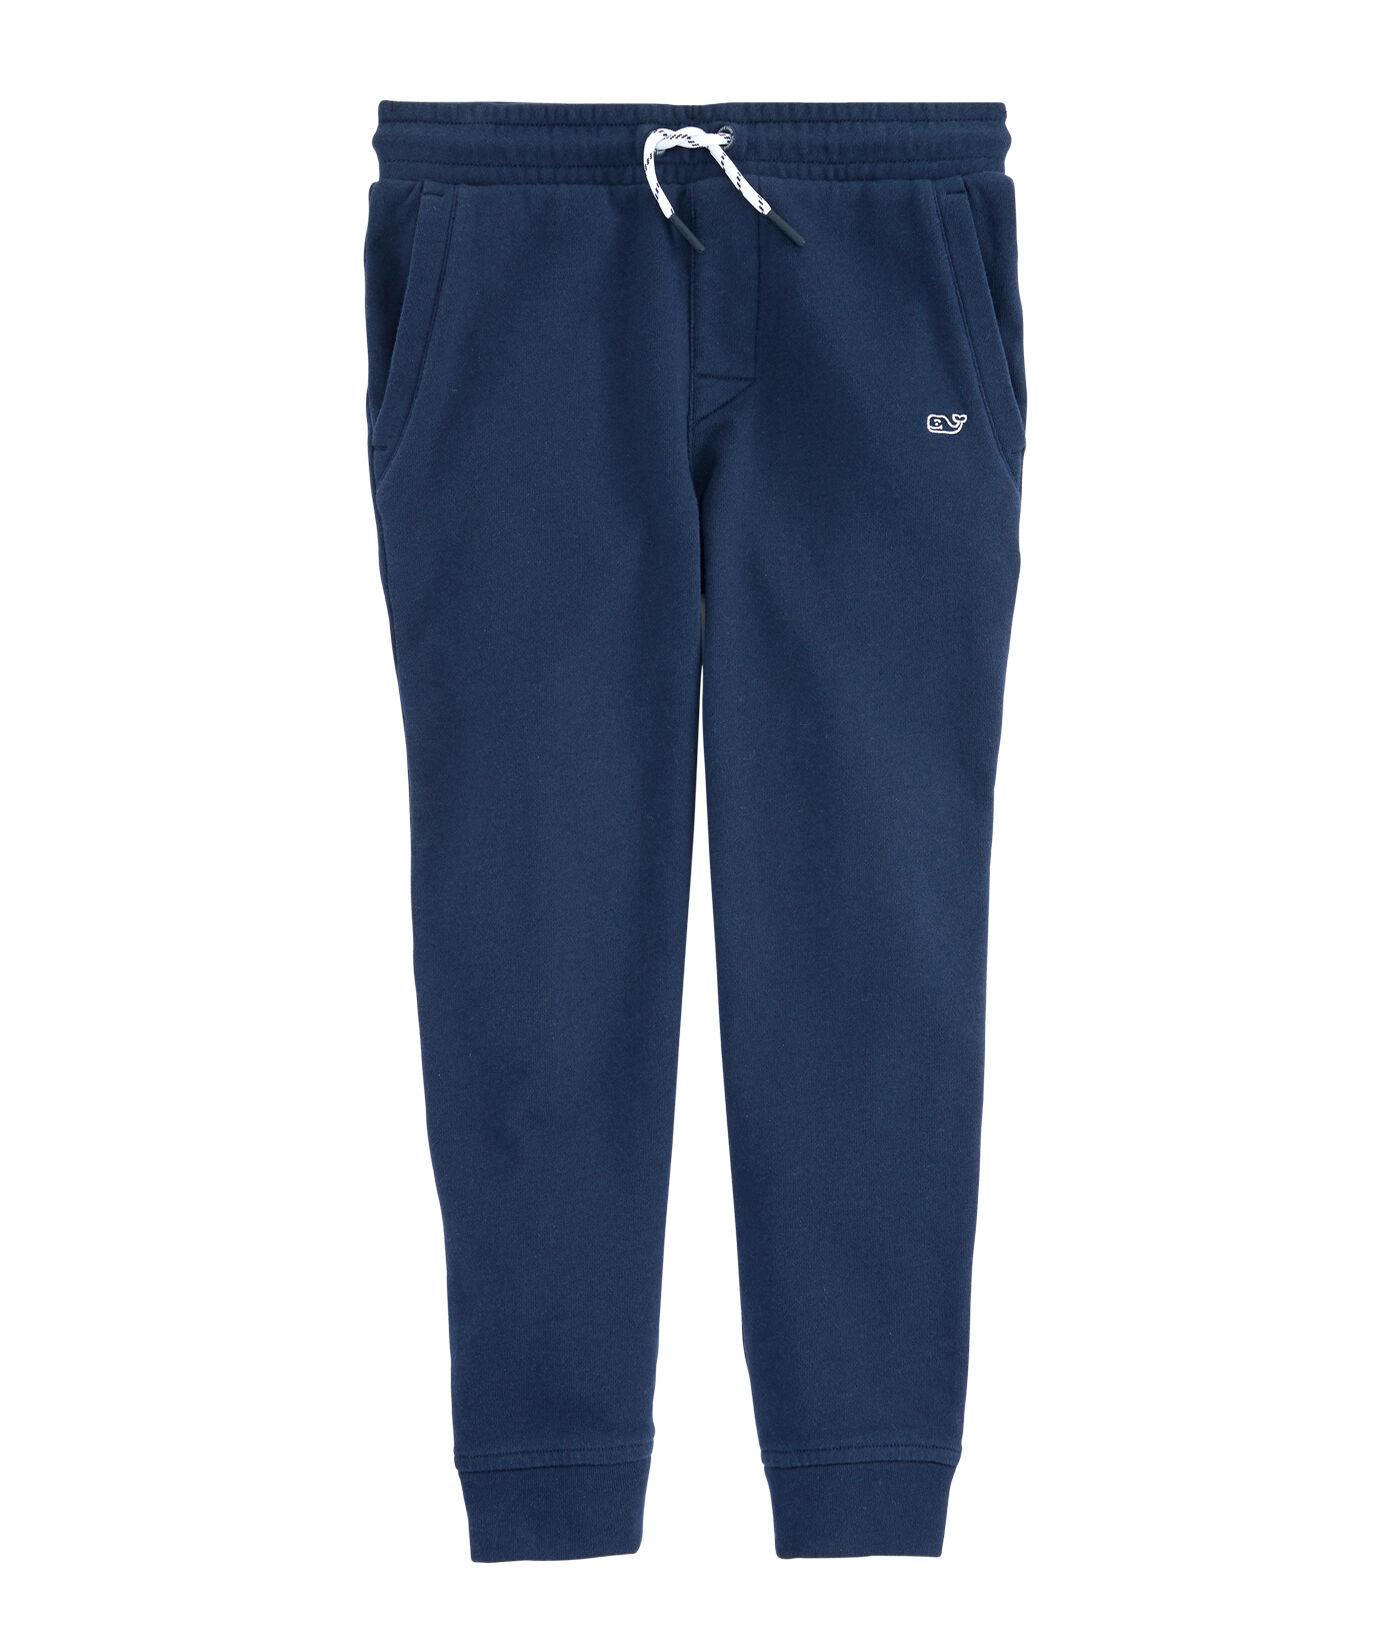 Size 4t Boy's Vineyard Vines Pants Clothing, Shoes & Accessories